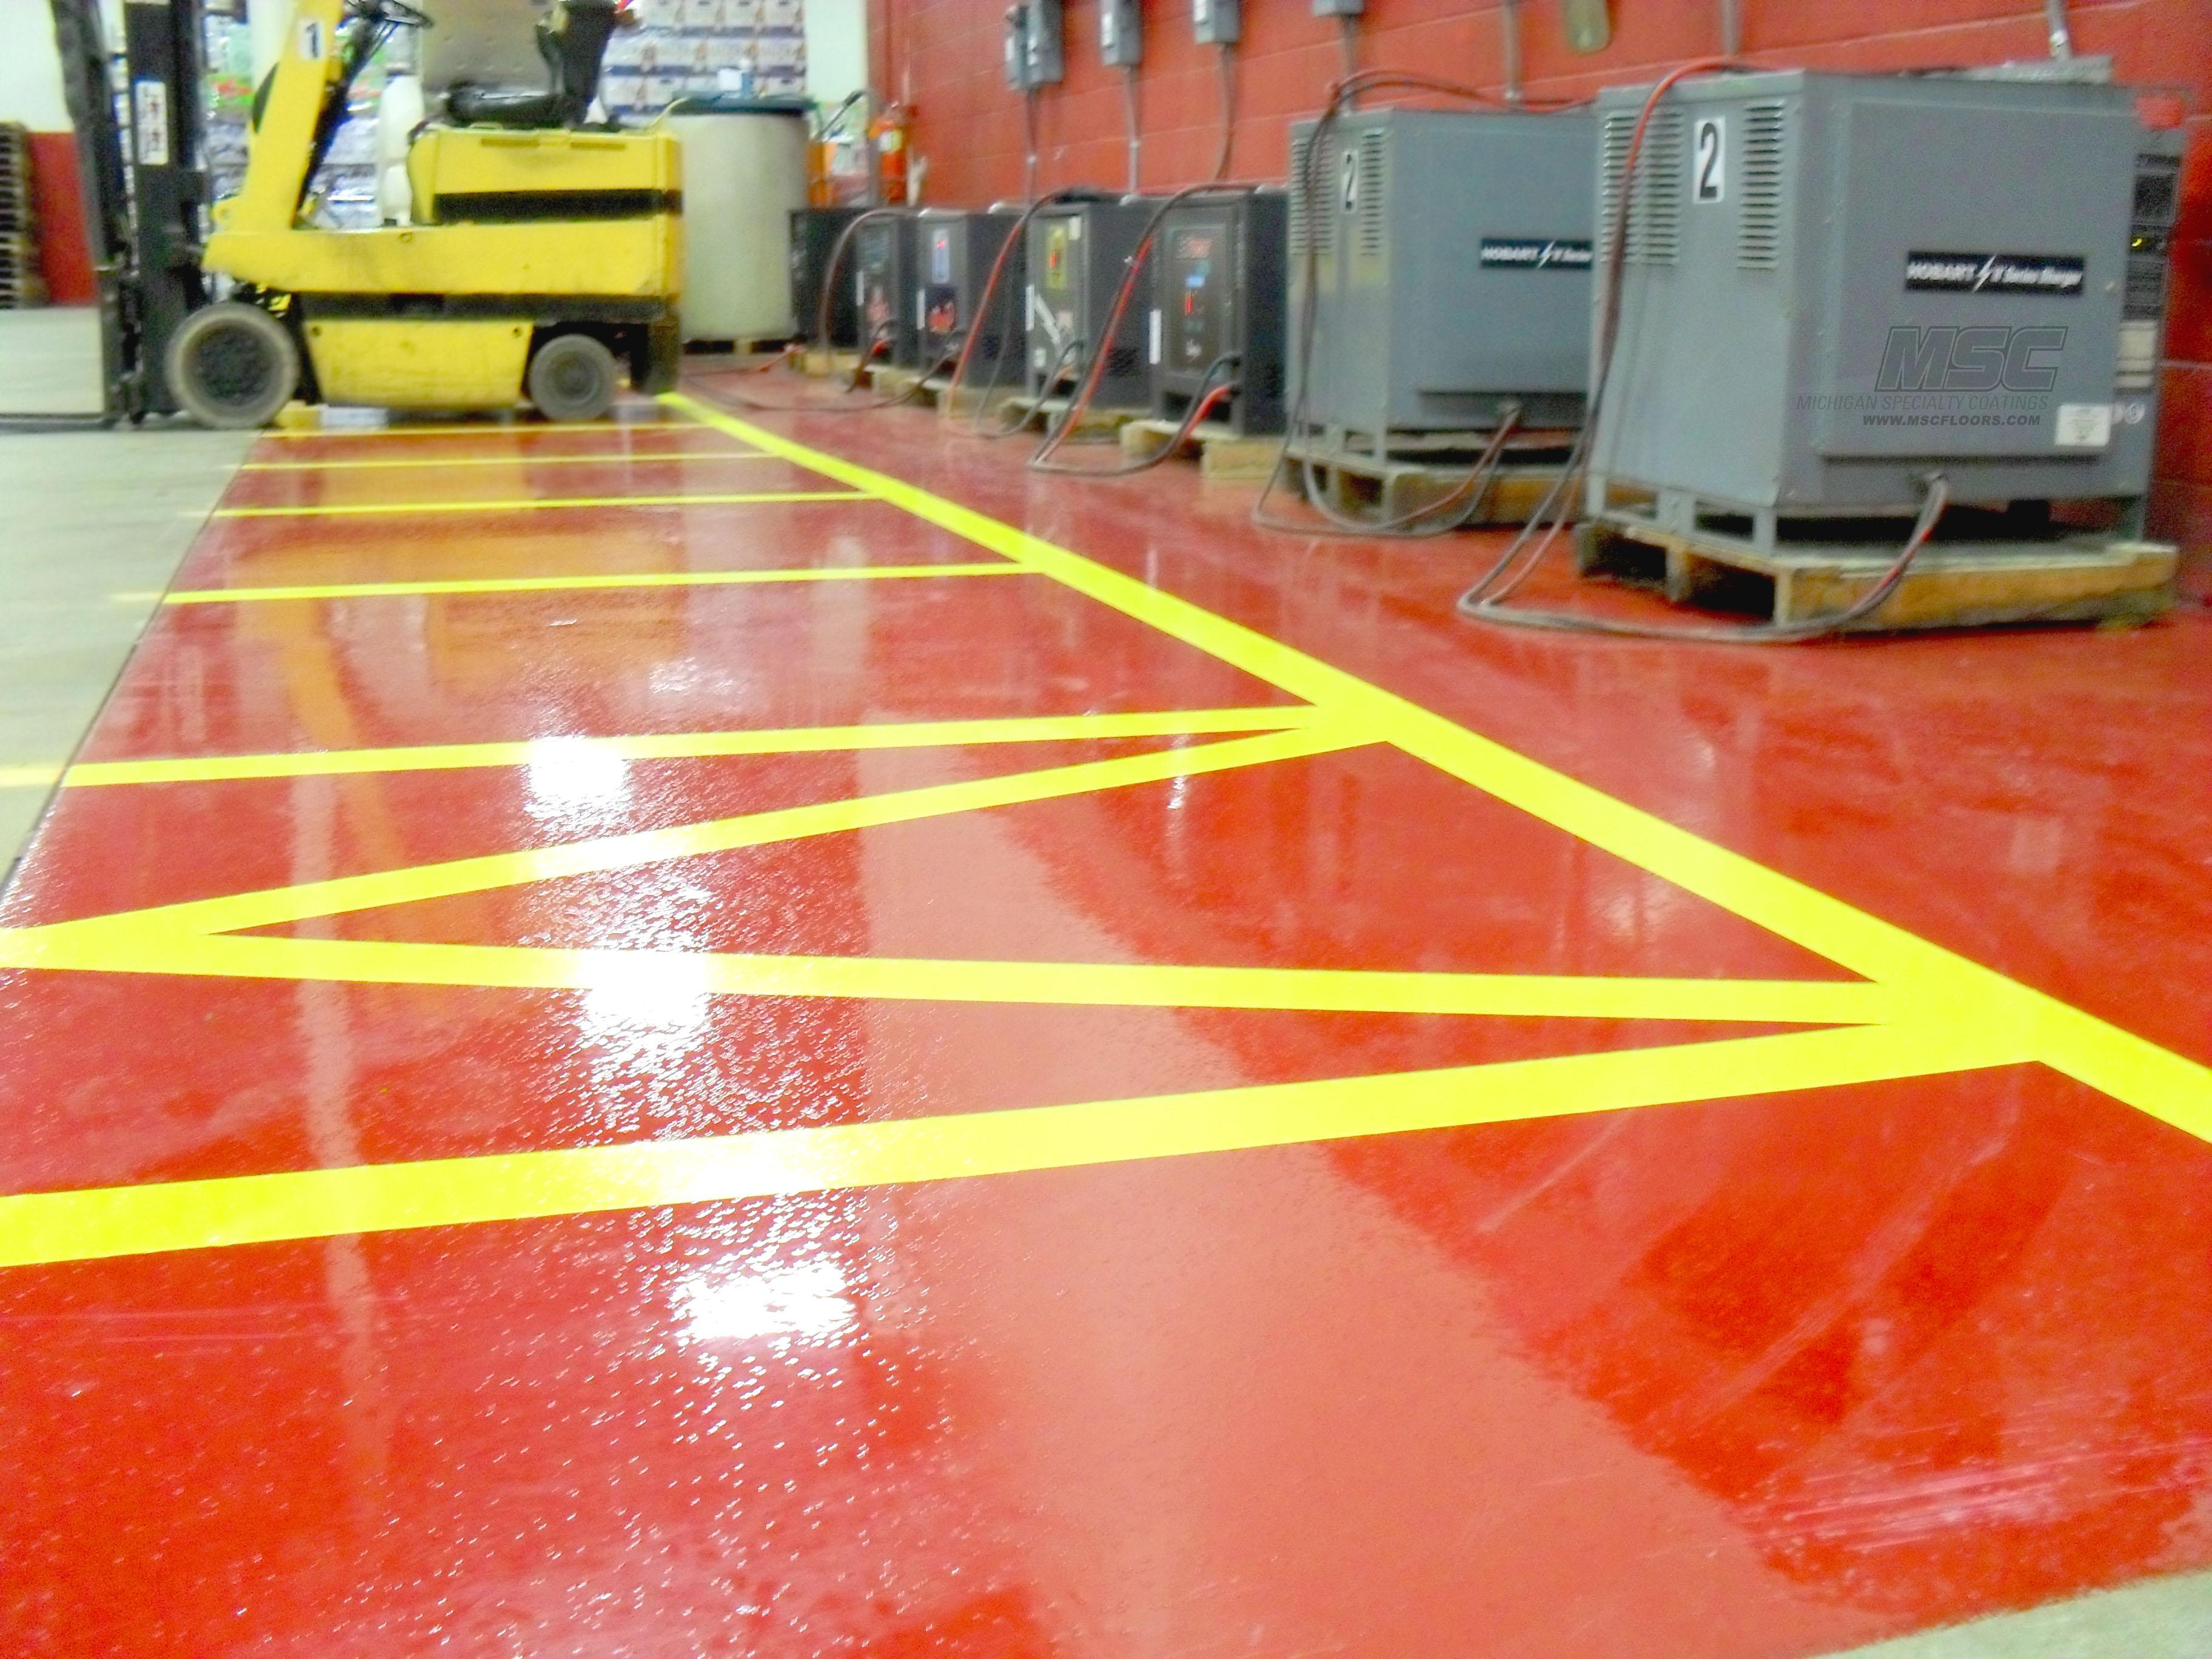 Osha Floor Elevation Change : Osha concrete floor striping standards in michigan